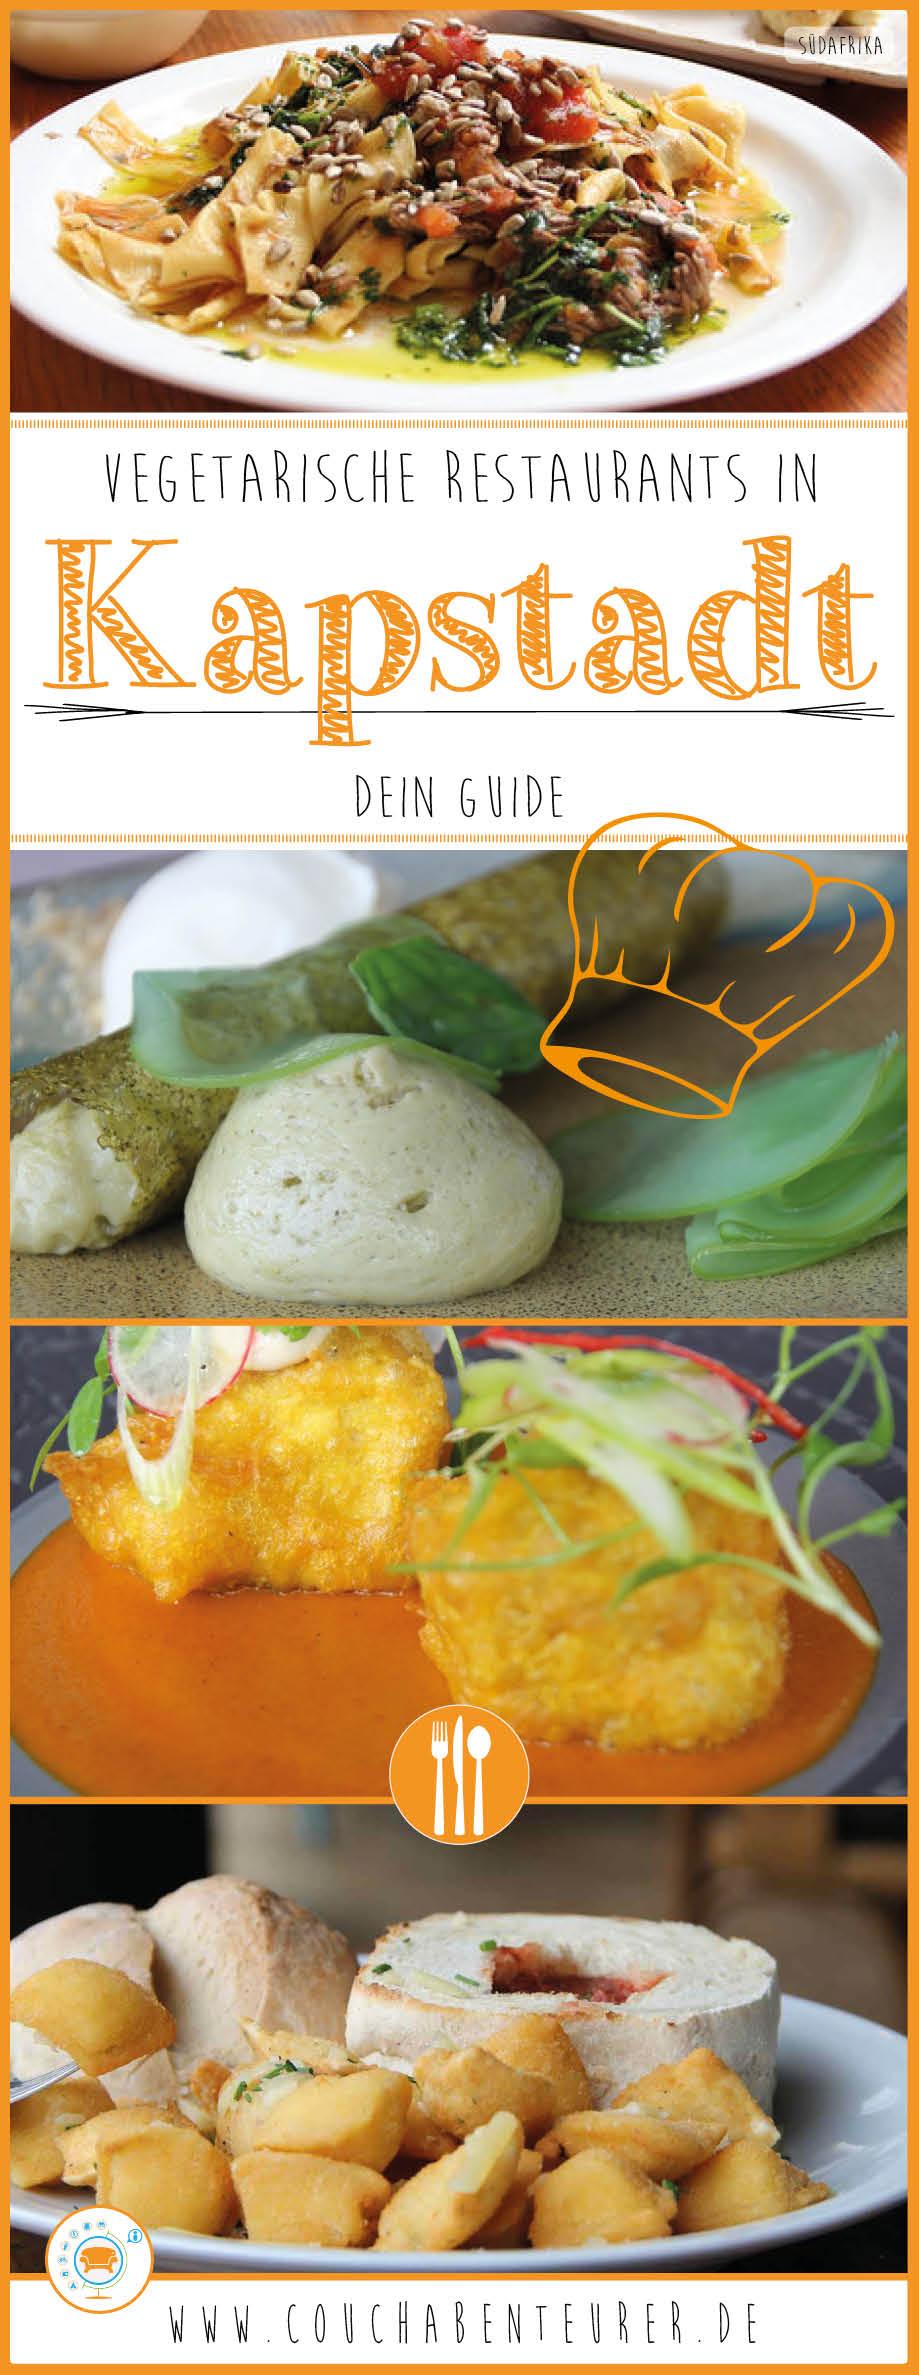 Vegetarische-Restaurants-Kapstadt-dein-guide